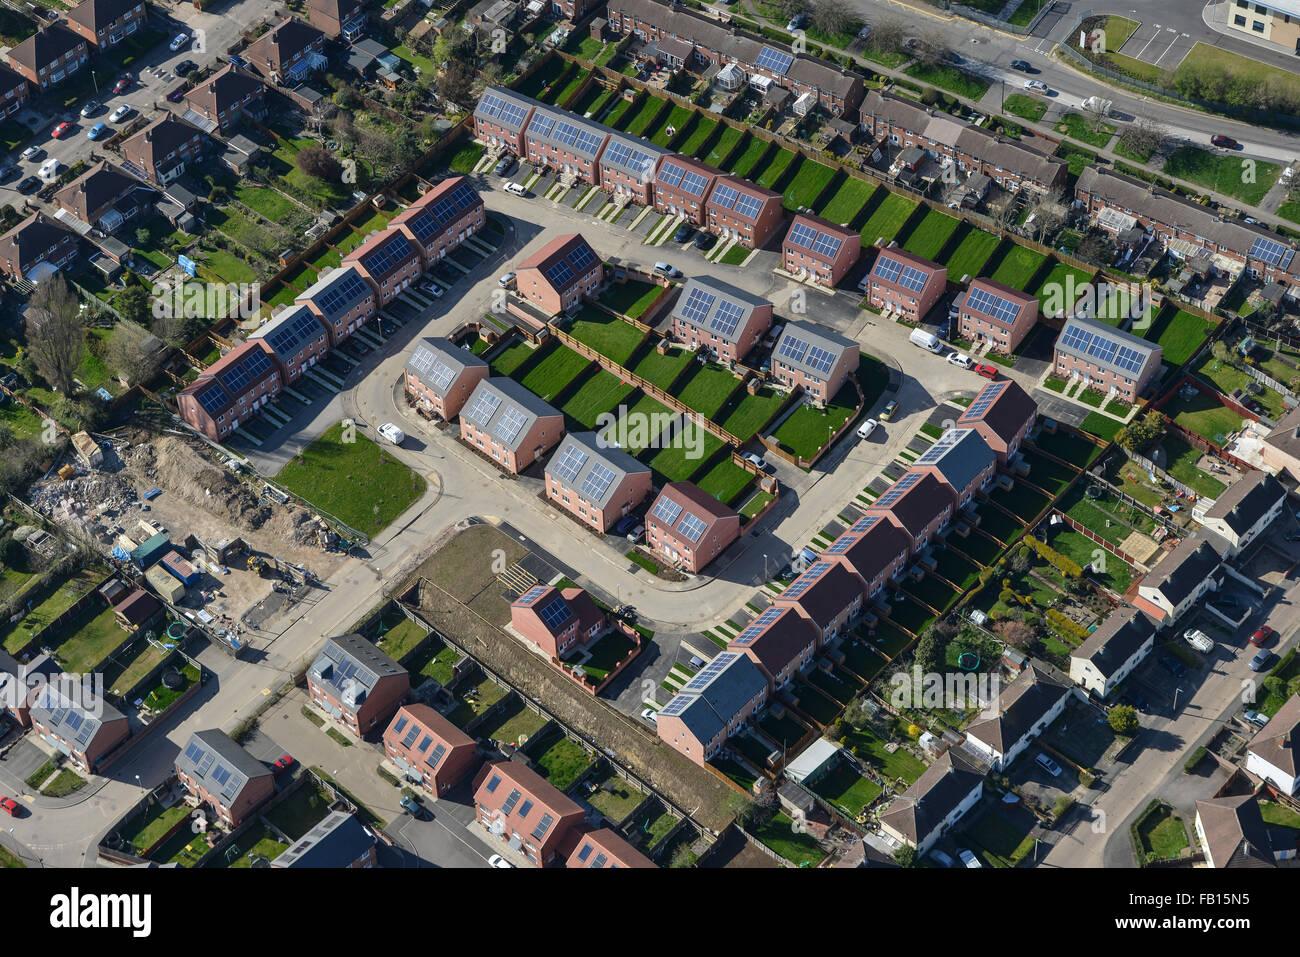 New Housing Development : A new infill housing development in the scraptoft area of